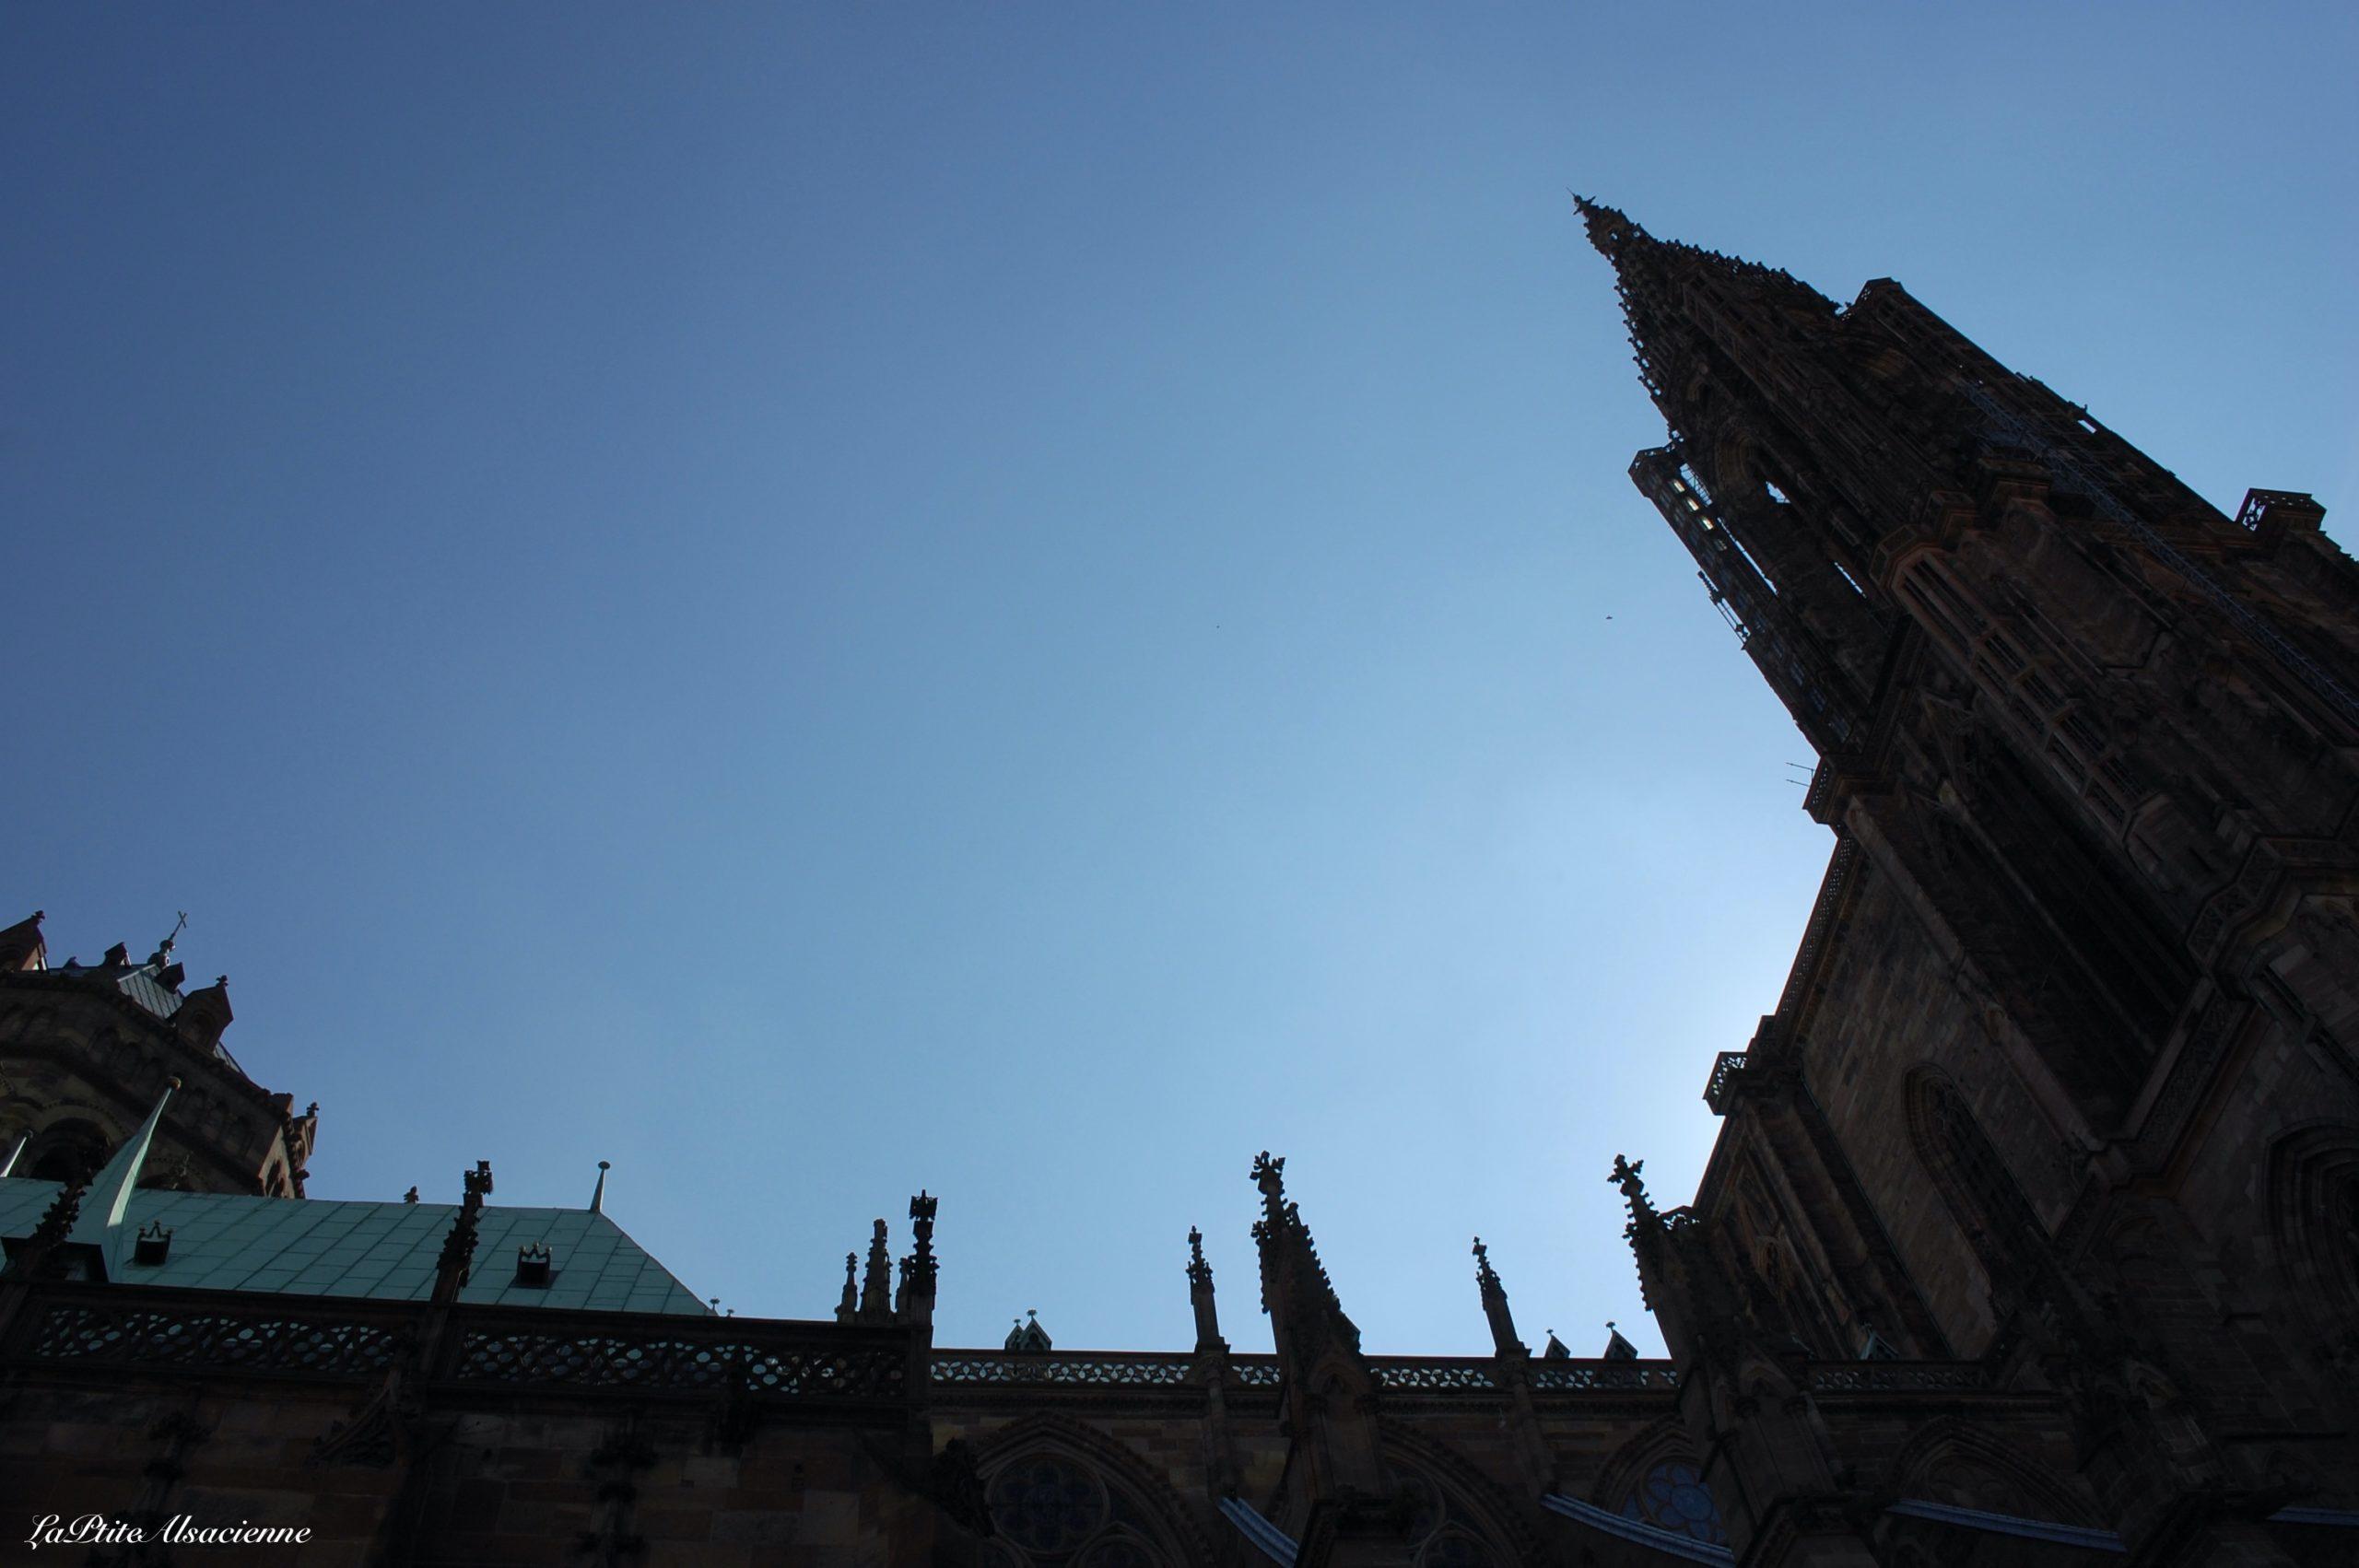 Cathédrale de Strasbourg - Photo de Cendrine Miesch